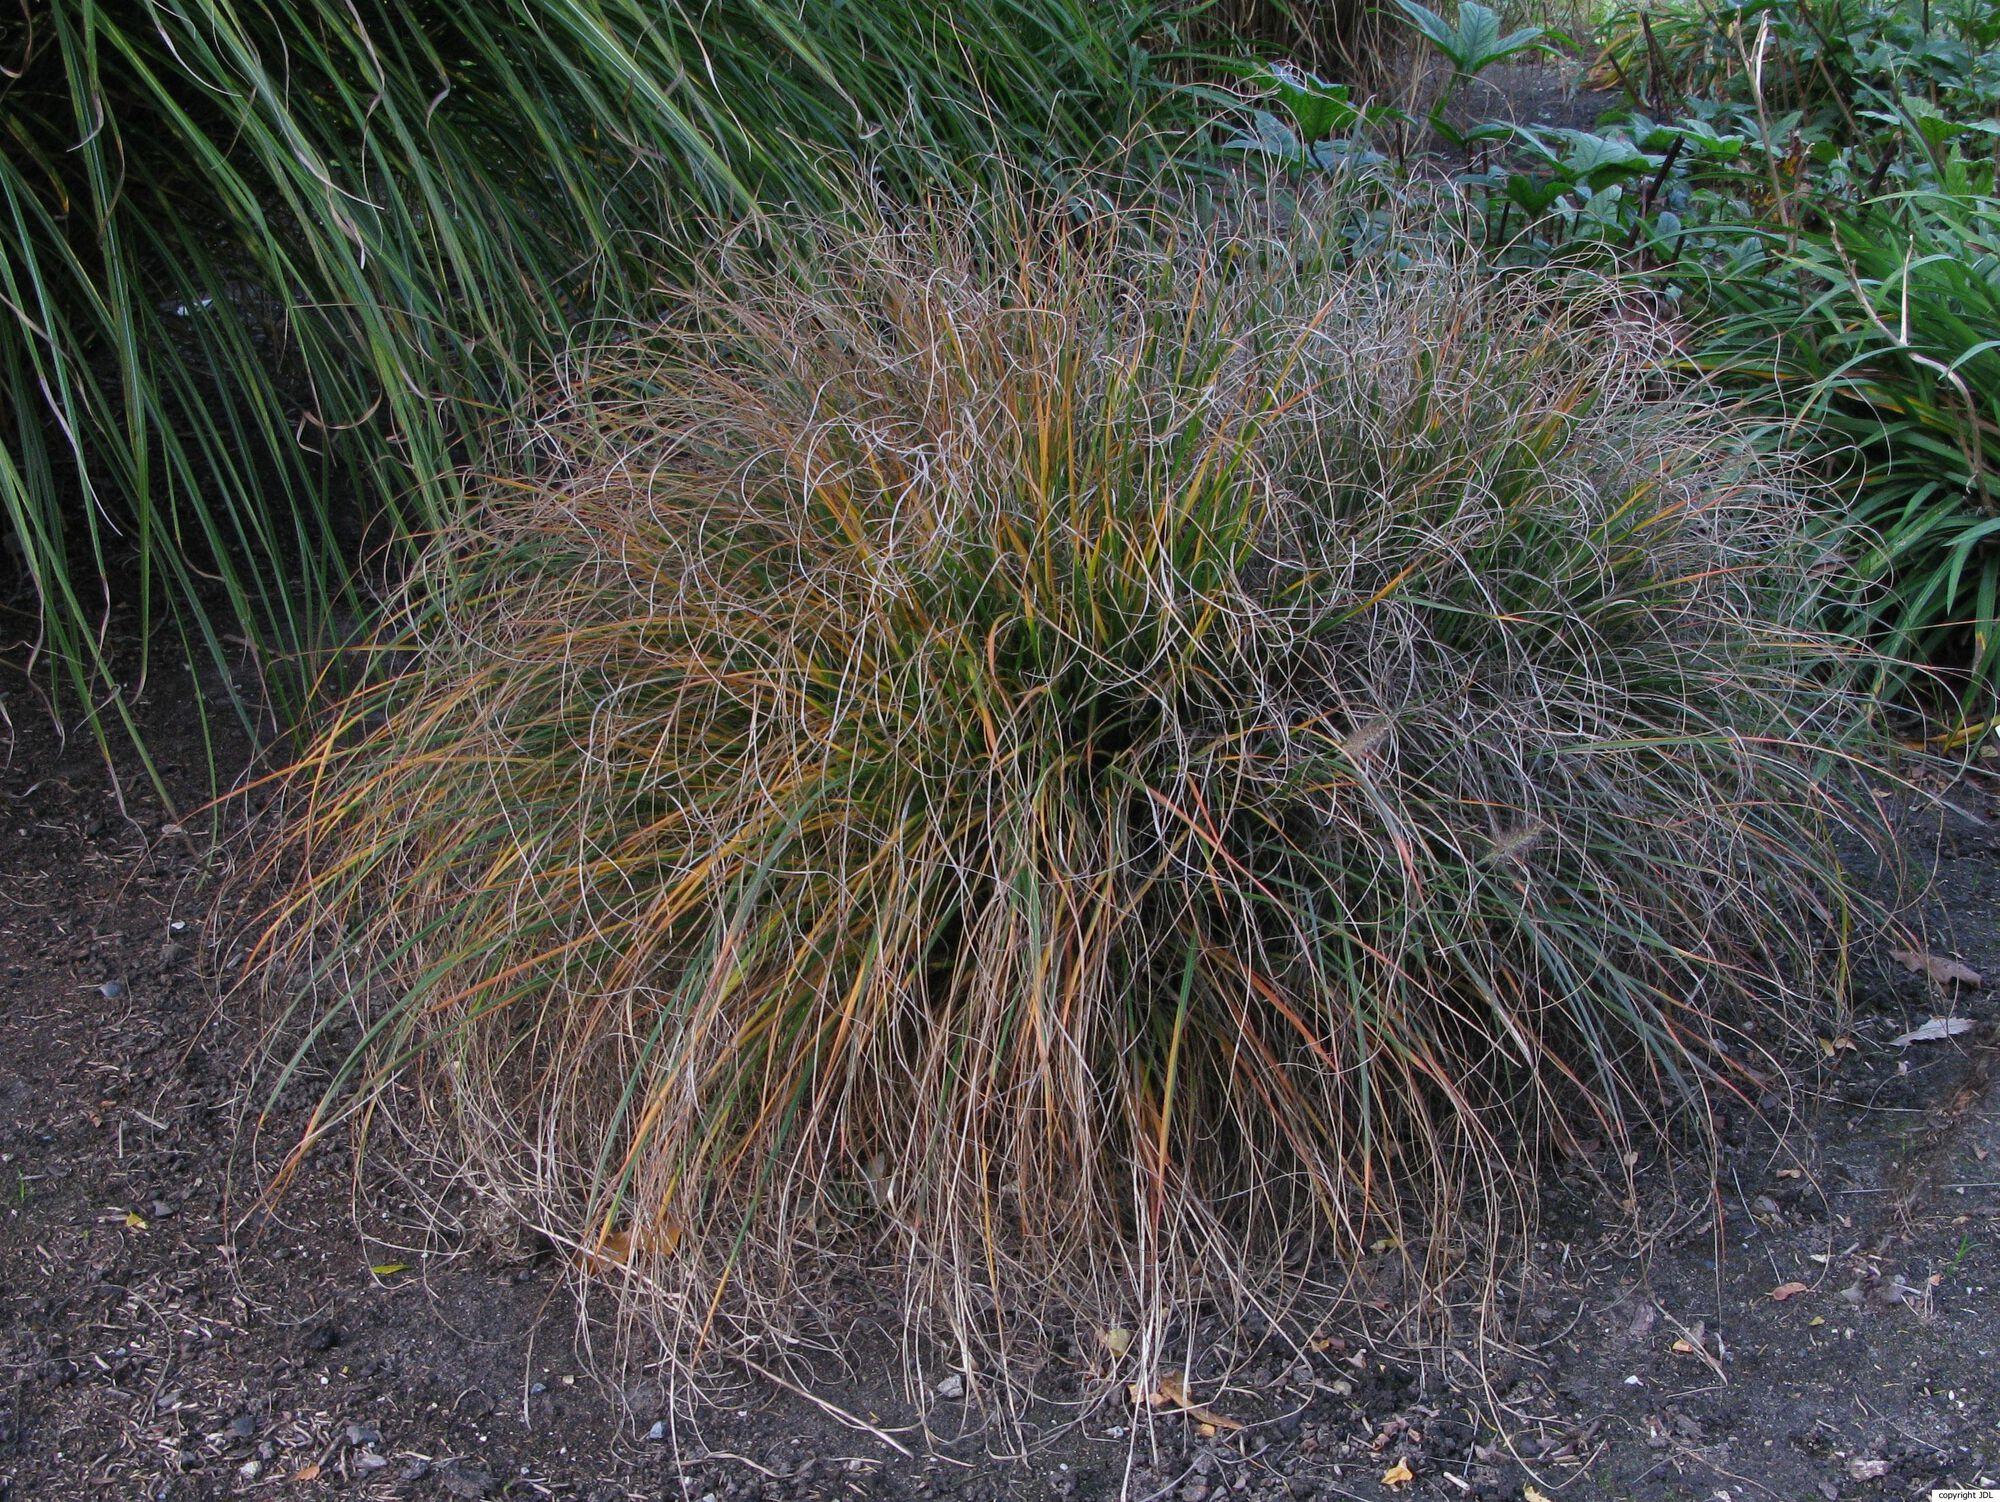 Pennisetum alopecuroides (L.) Spreng. 'Hameln'